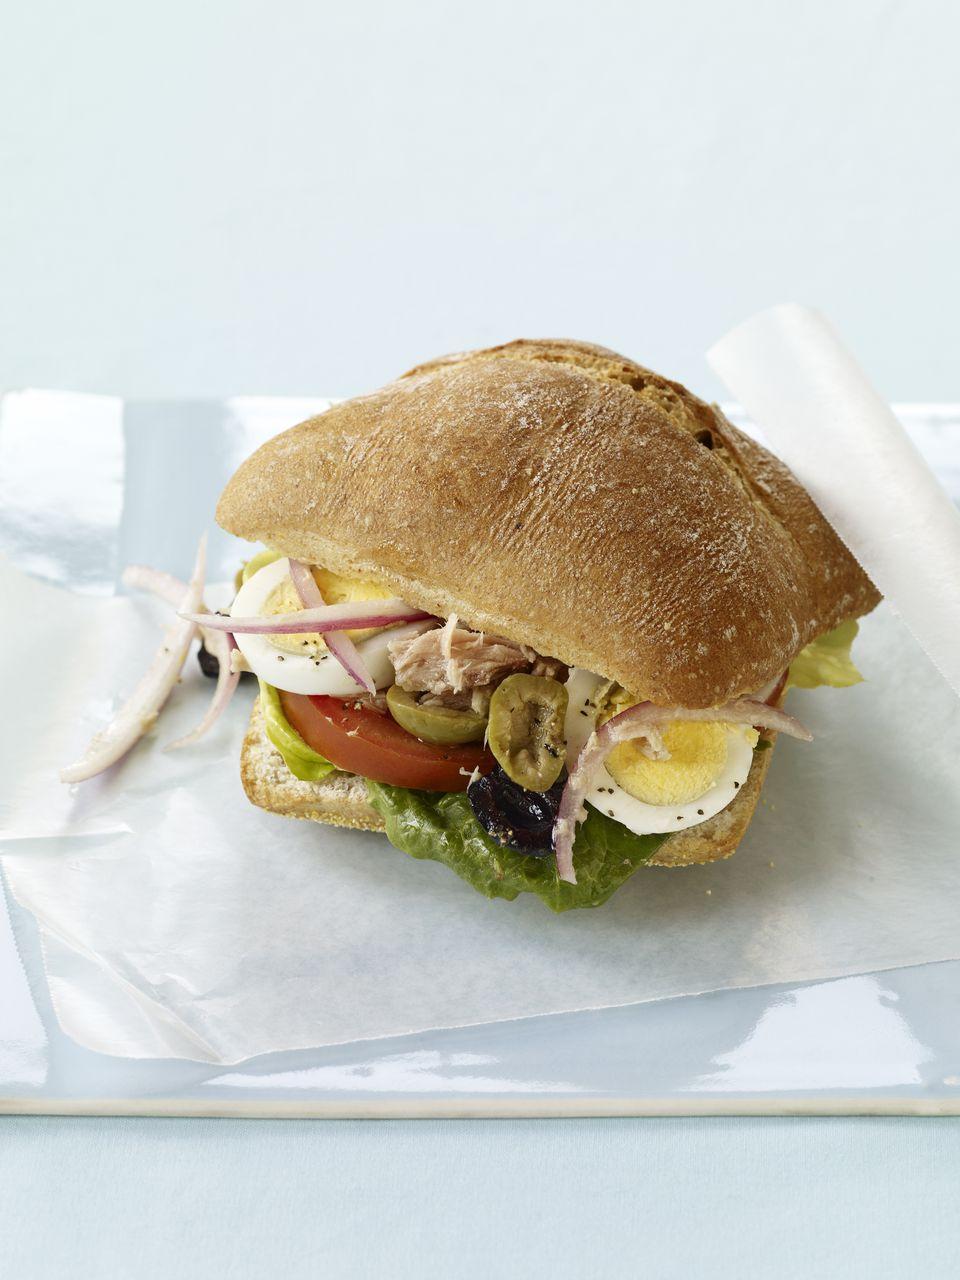 tuna nicoise style sandwich